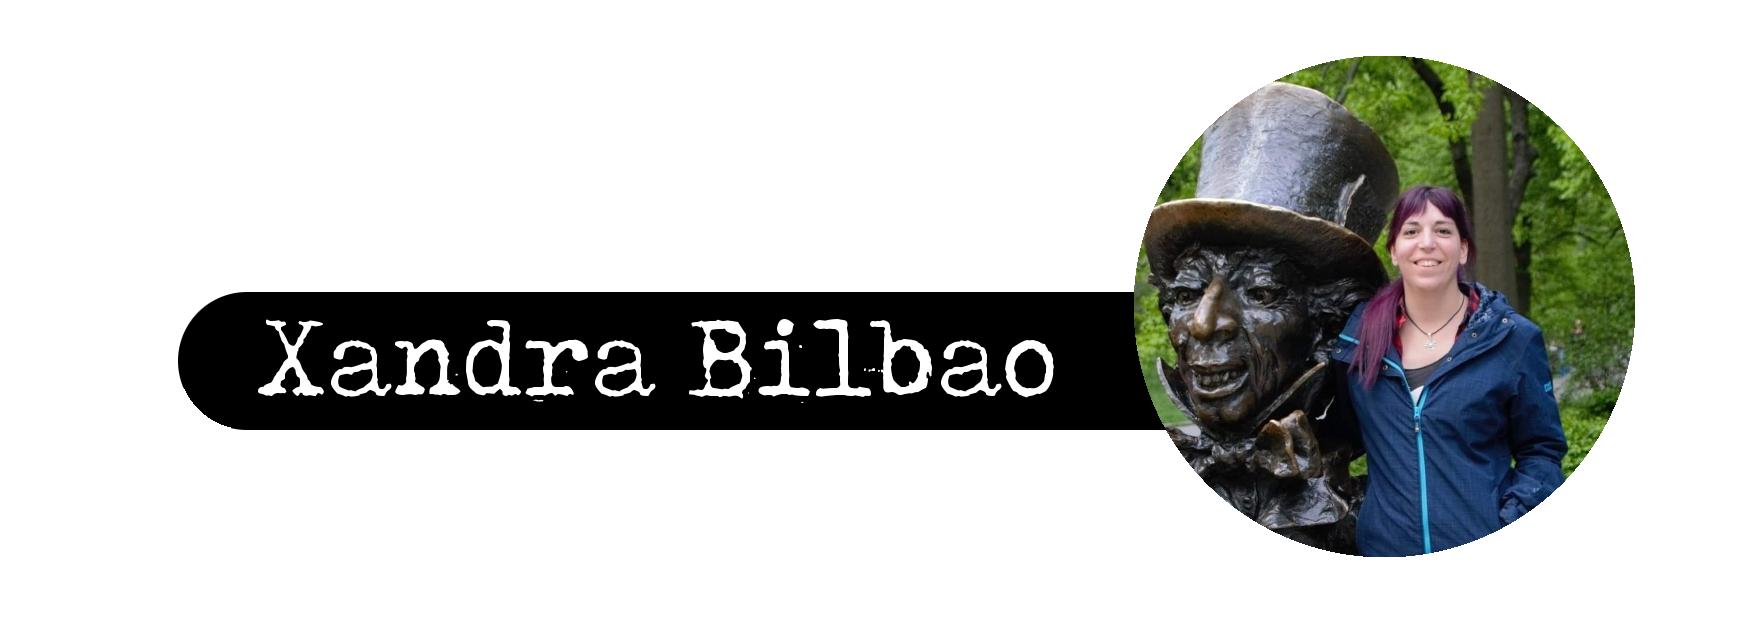 Xandra Bilbao